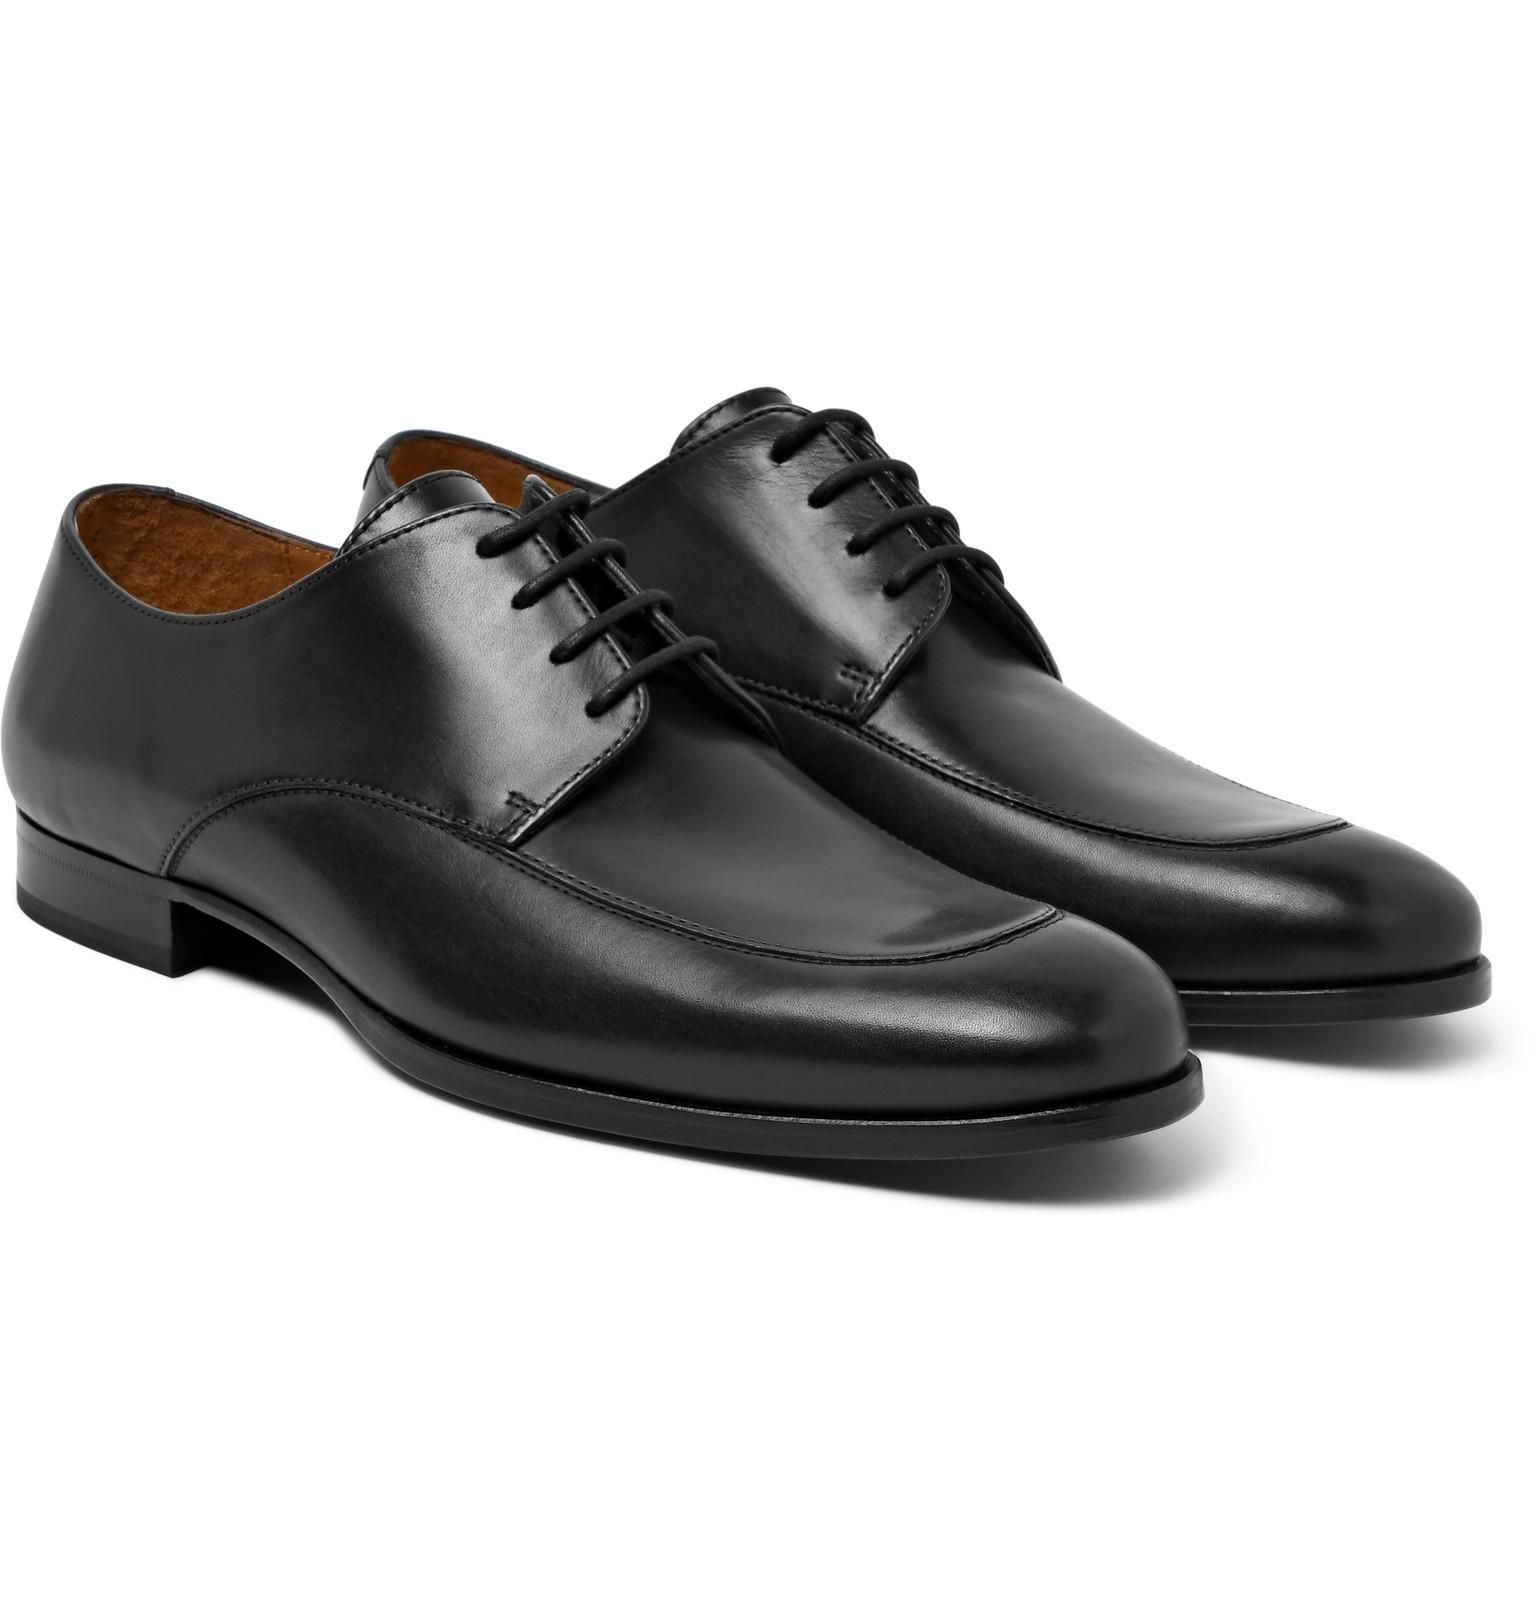 Cheap Designer Shoes Hugo Boss Hanover Leather Derby Shoes Black Men